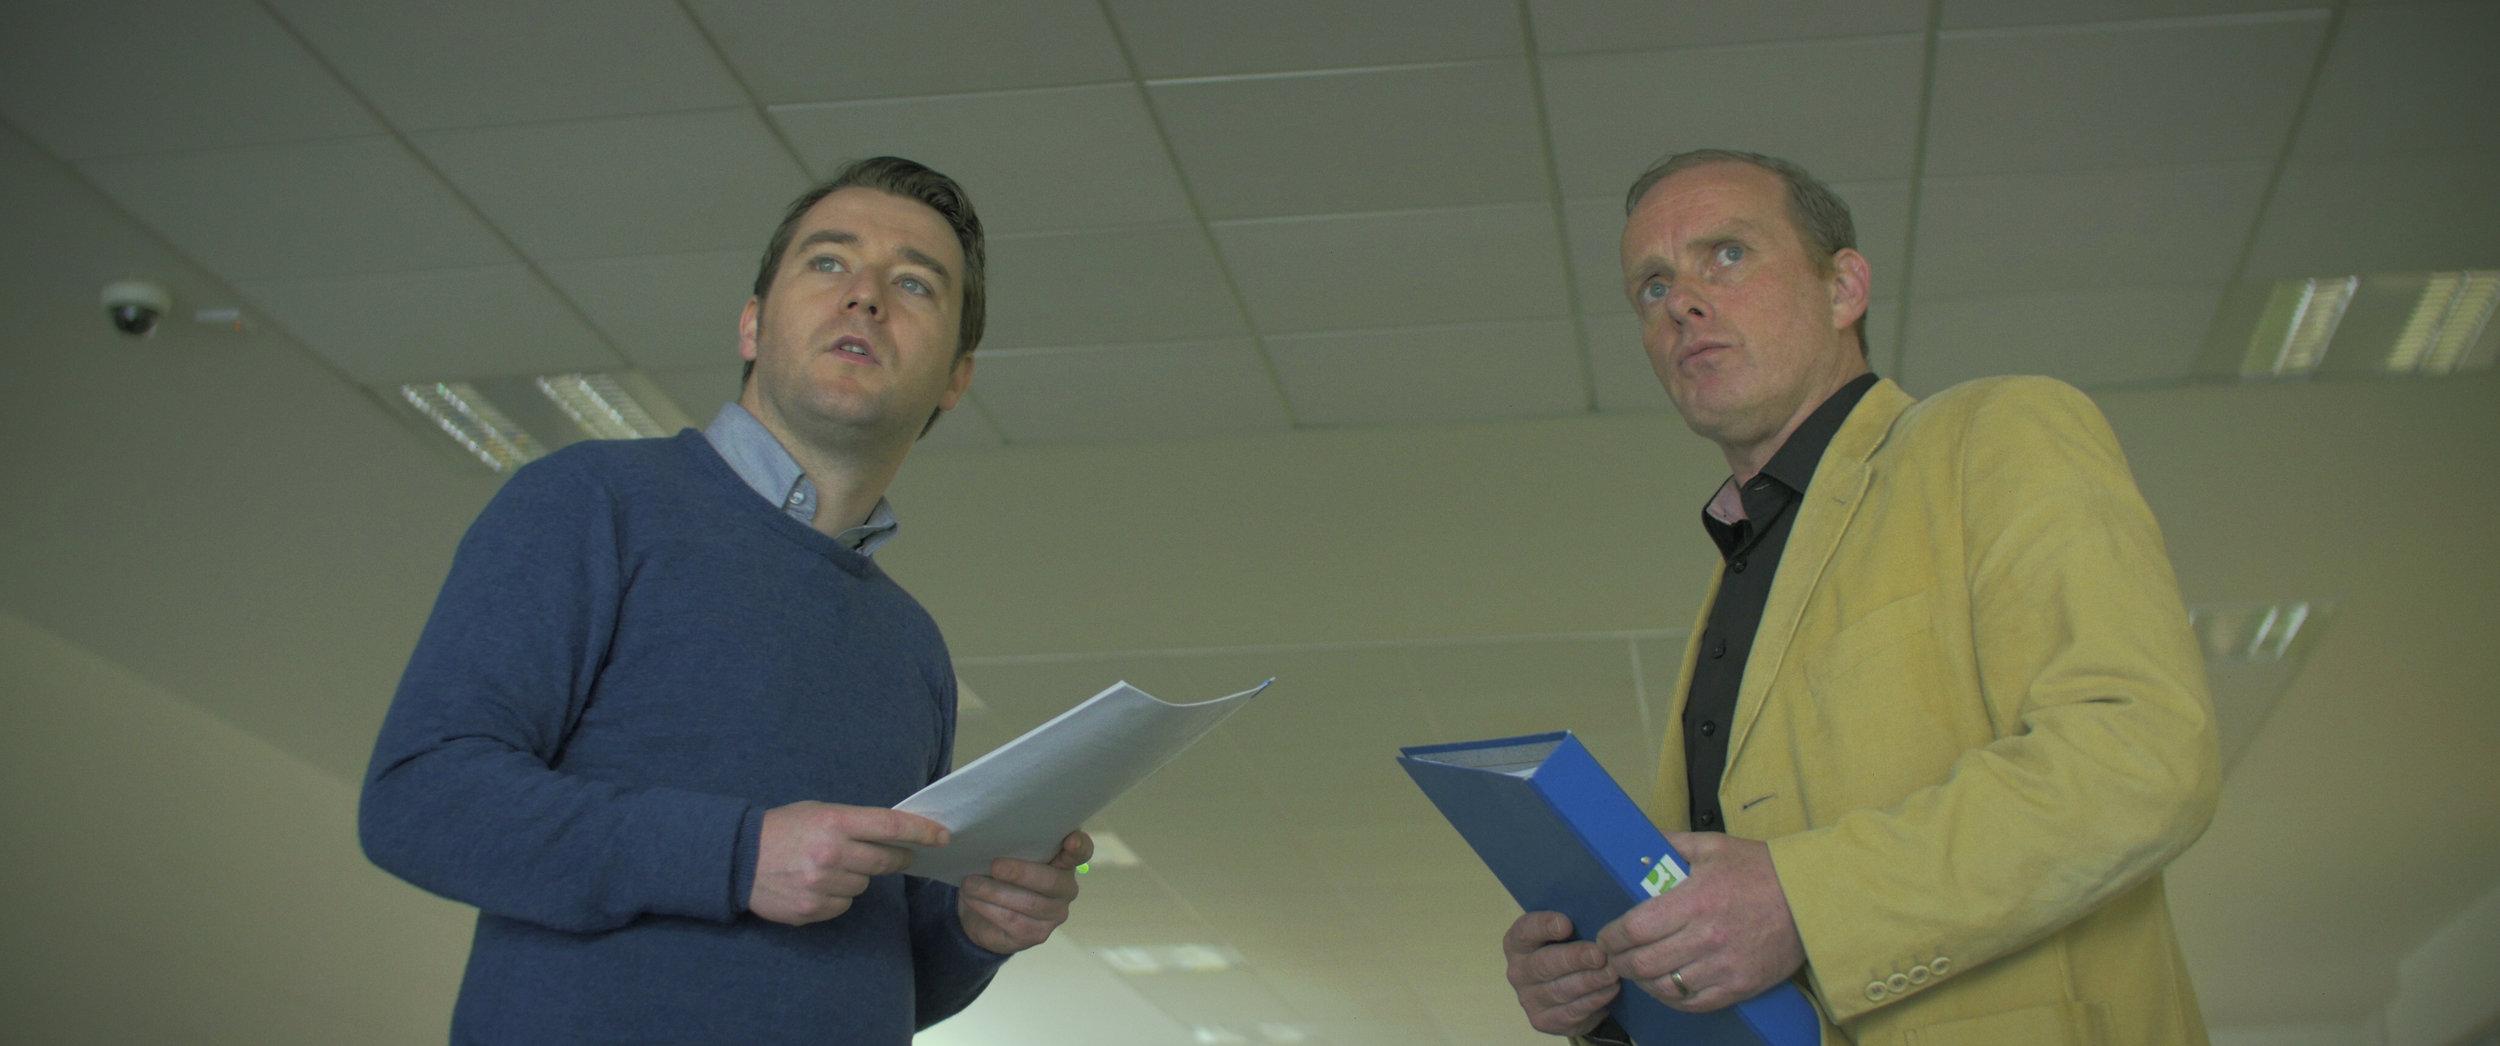 John Morton and Ciaran McCauley in Locus of Control